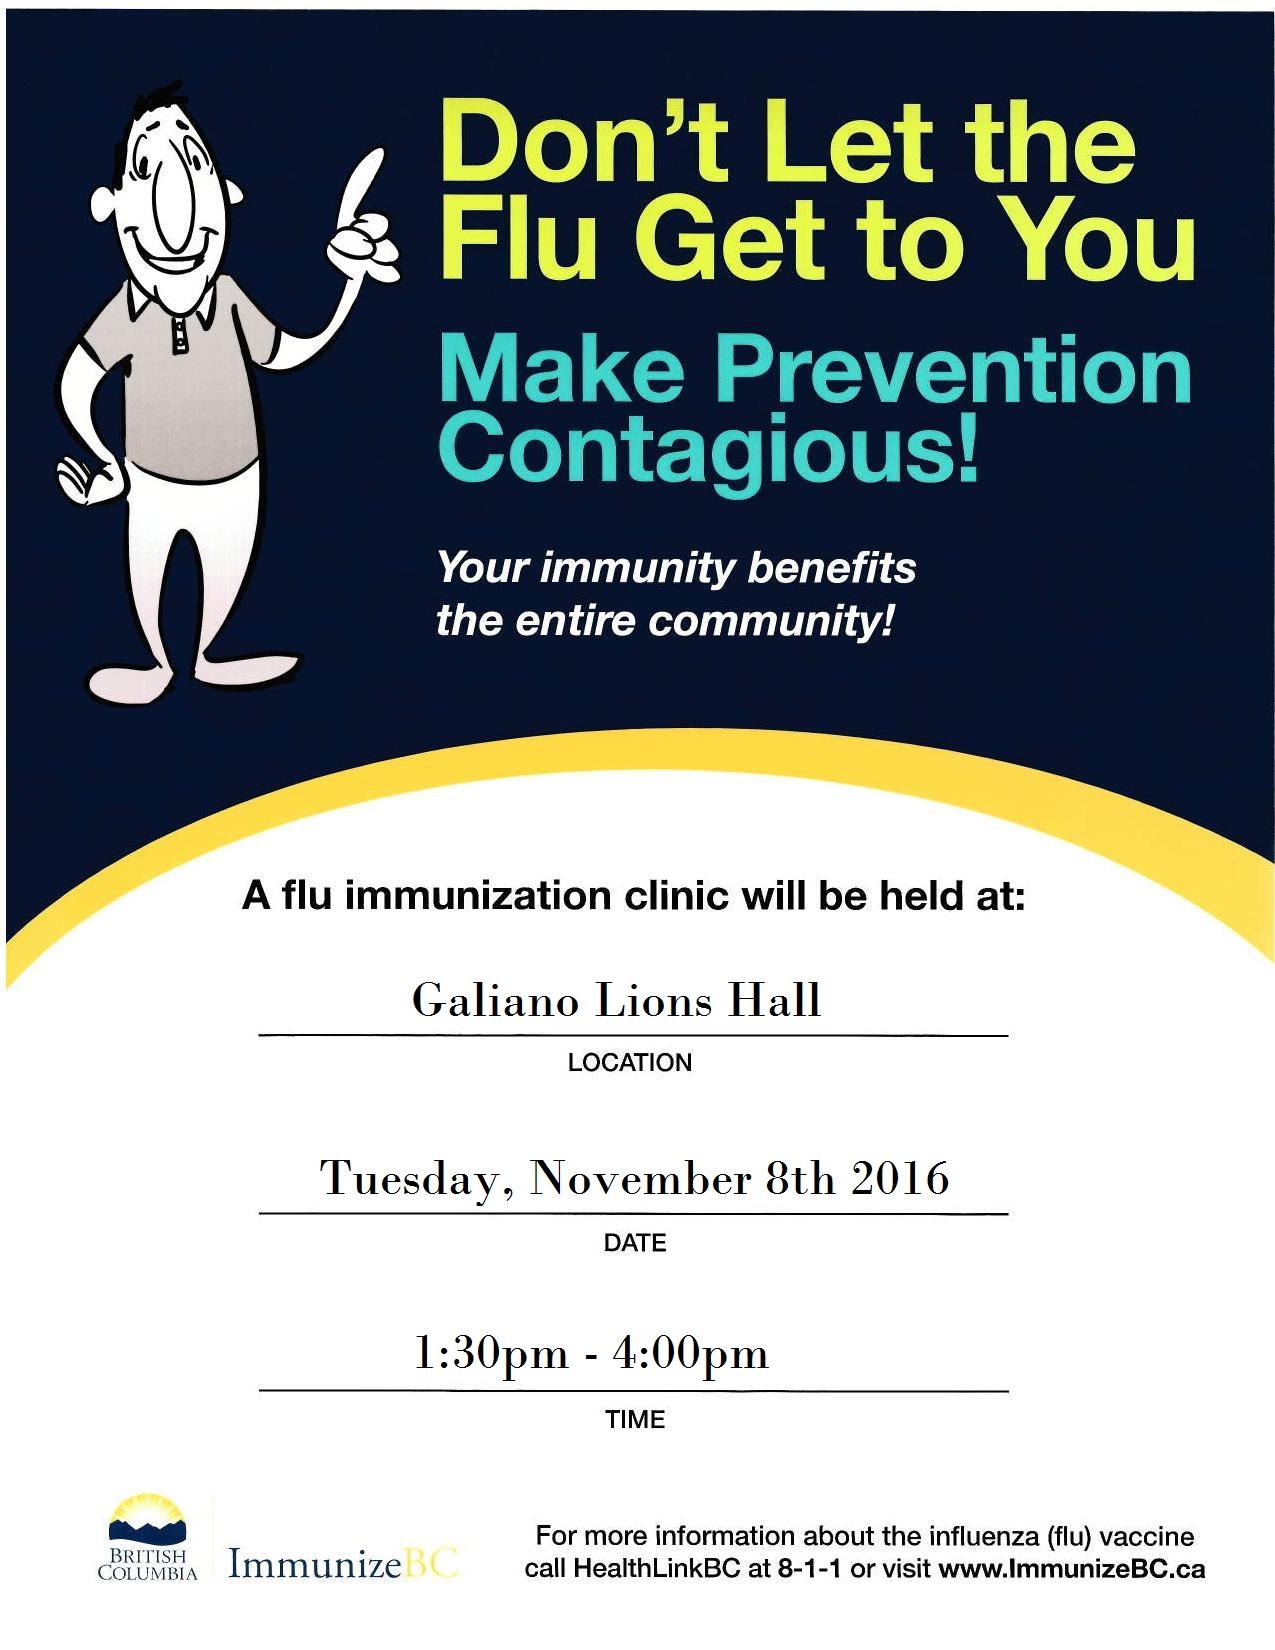 flu-posters-immunize-bc-page-003